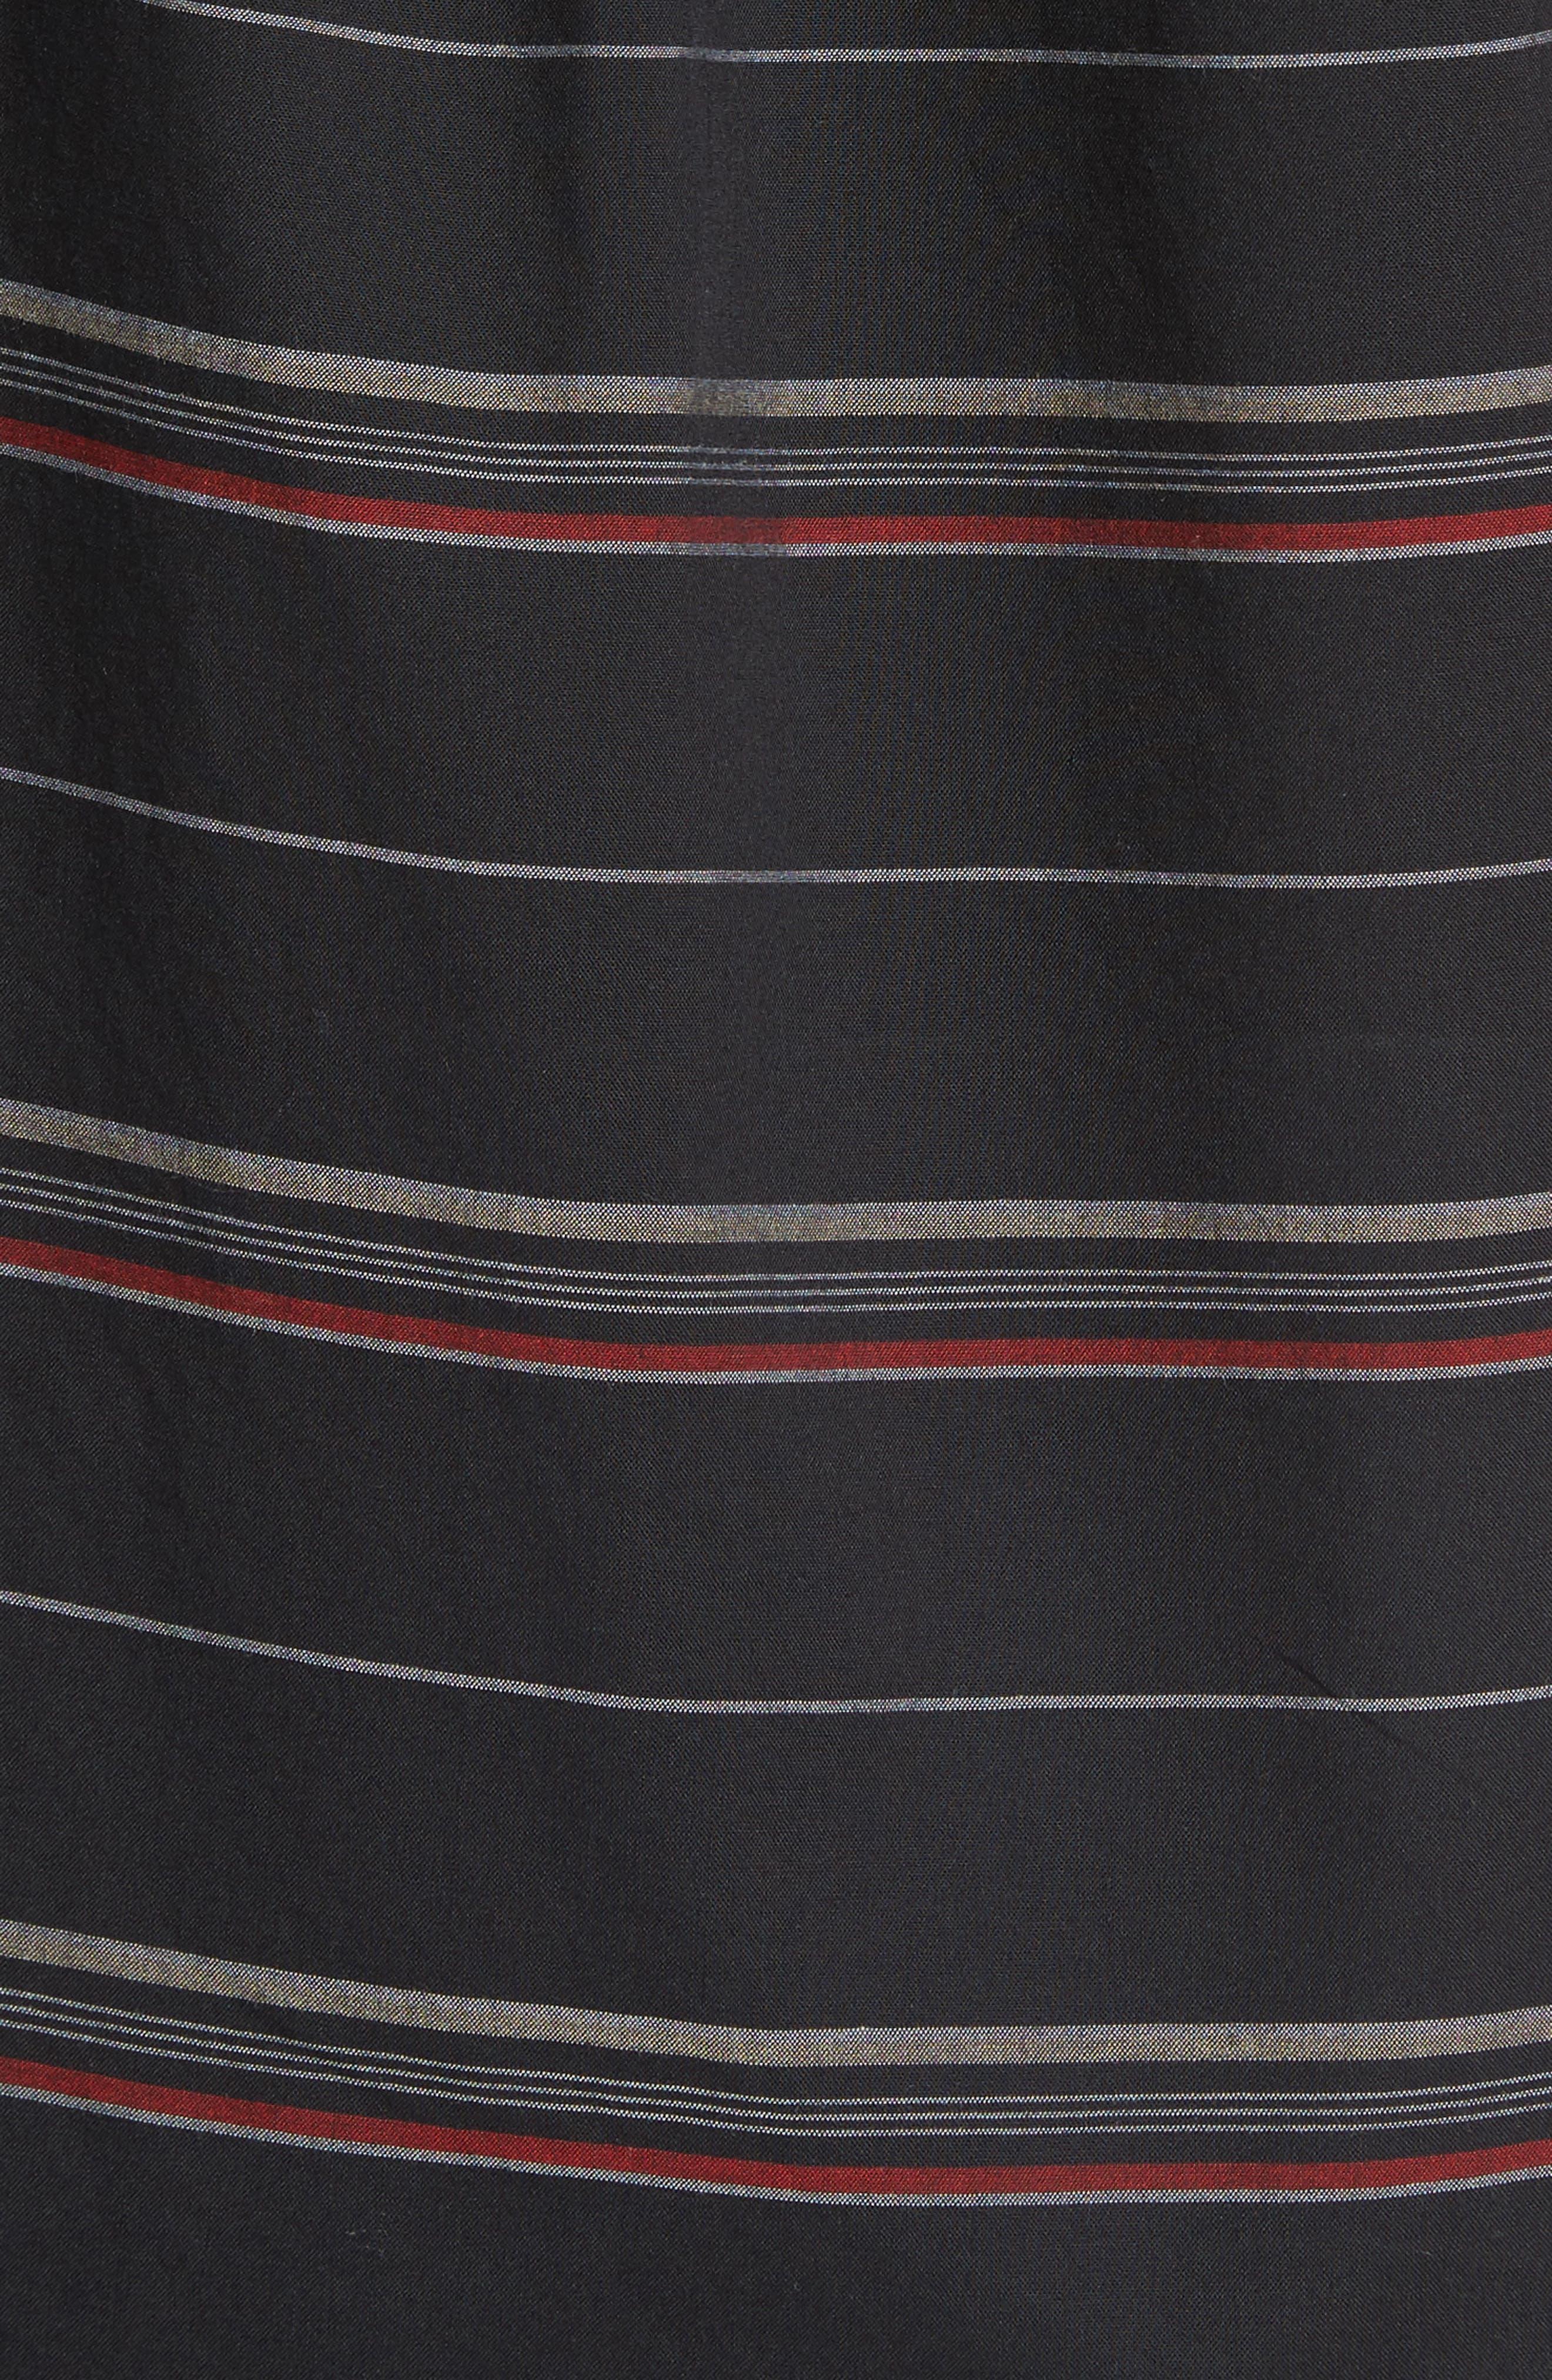 Striped Woven Shirt,                             Alternate thumbnail 14, color,